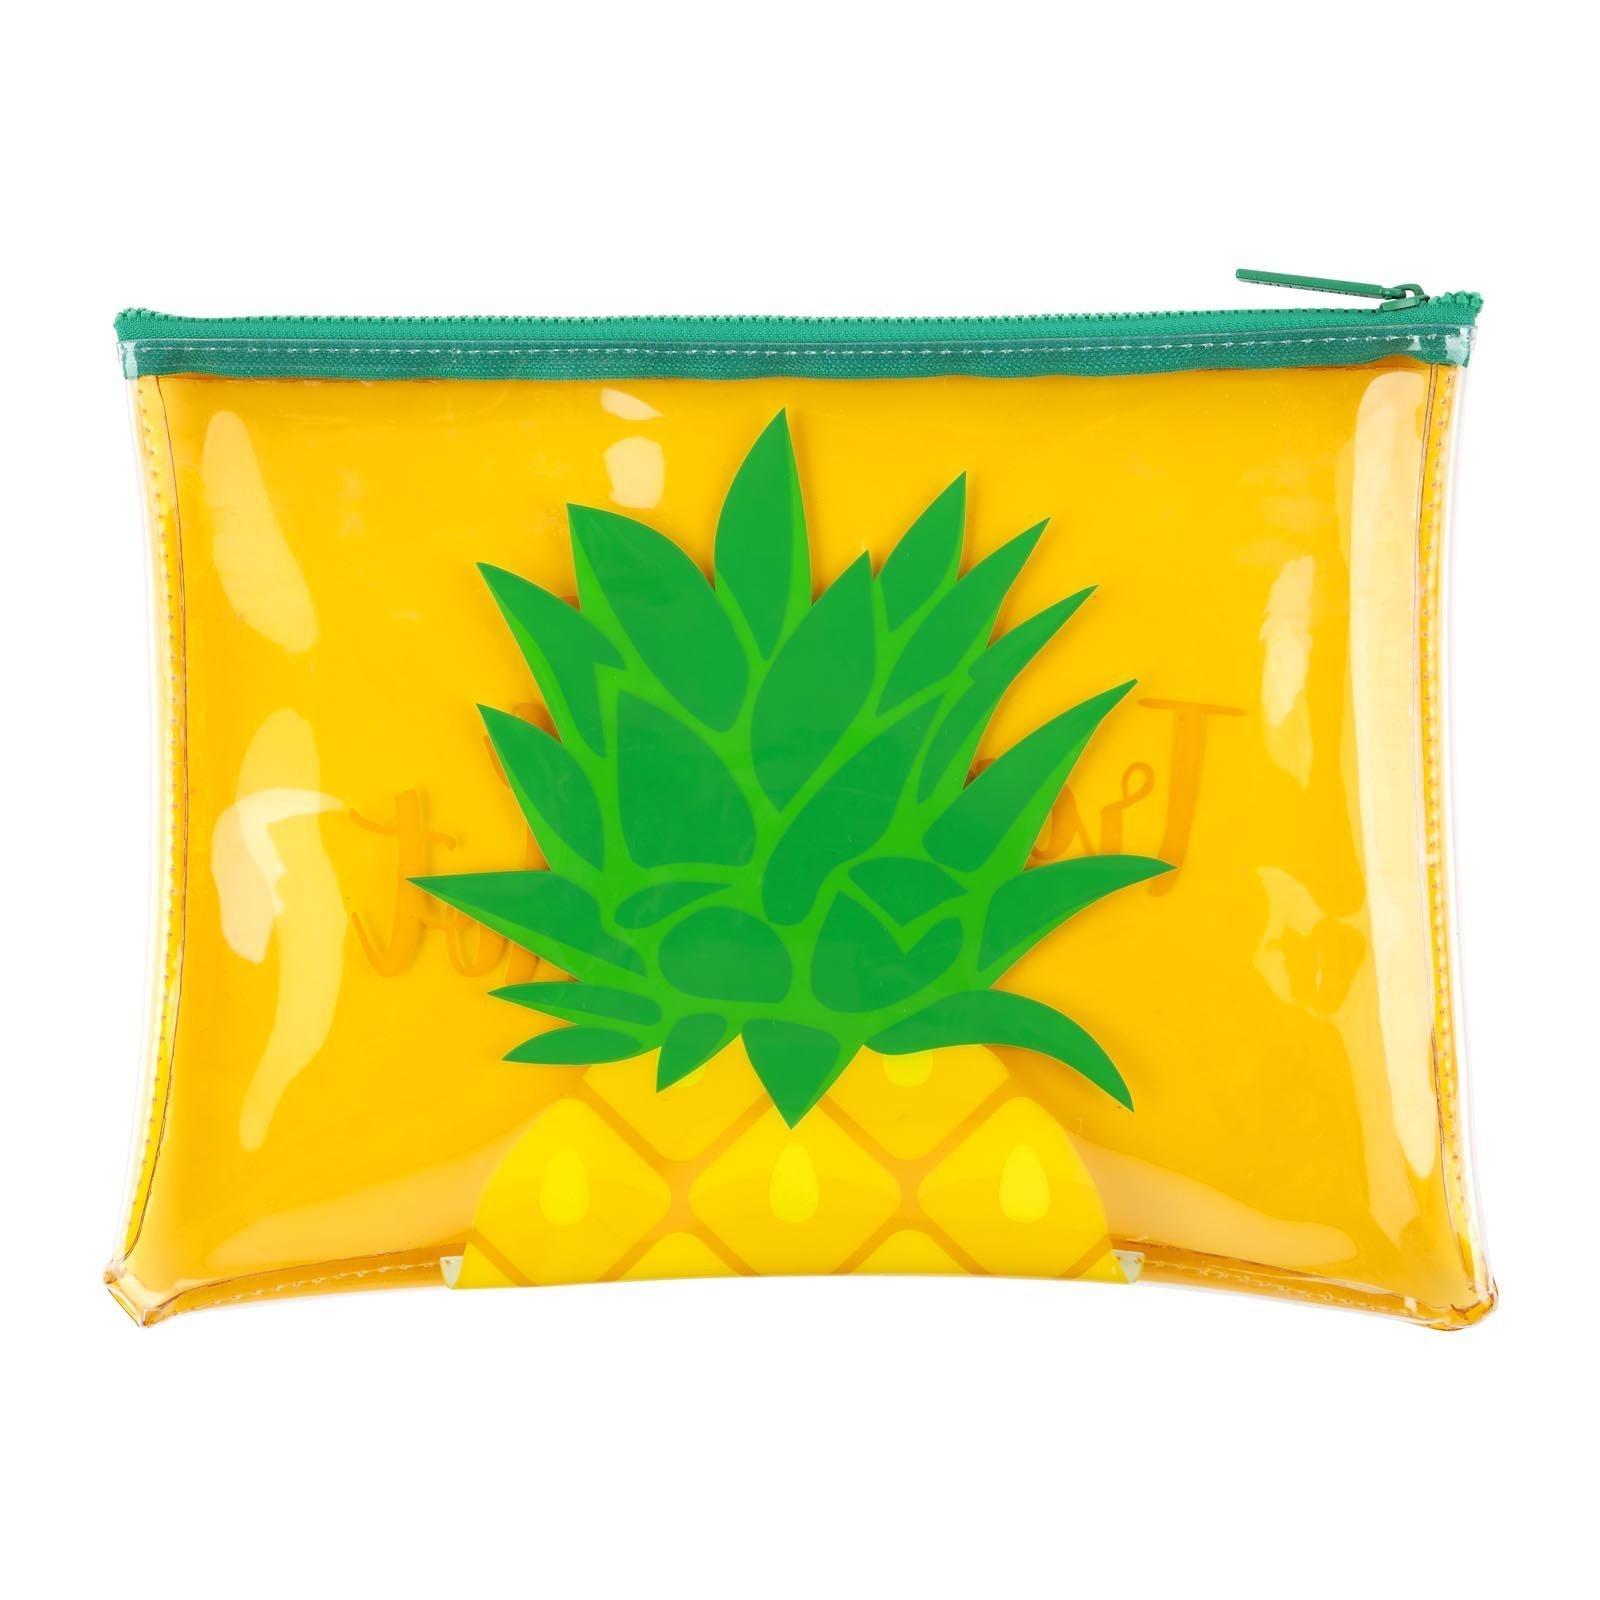 Sunnylife See Thru Beach Zipper Pouch Waterproof and Stylish Translucent Soft Plastic Handbag - Pineapple Yellow by SunnyLIFE (Image #1)